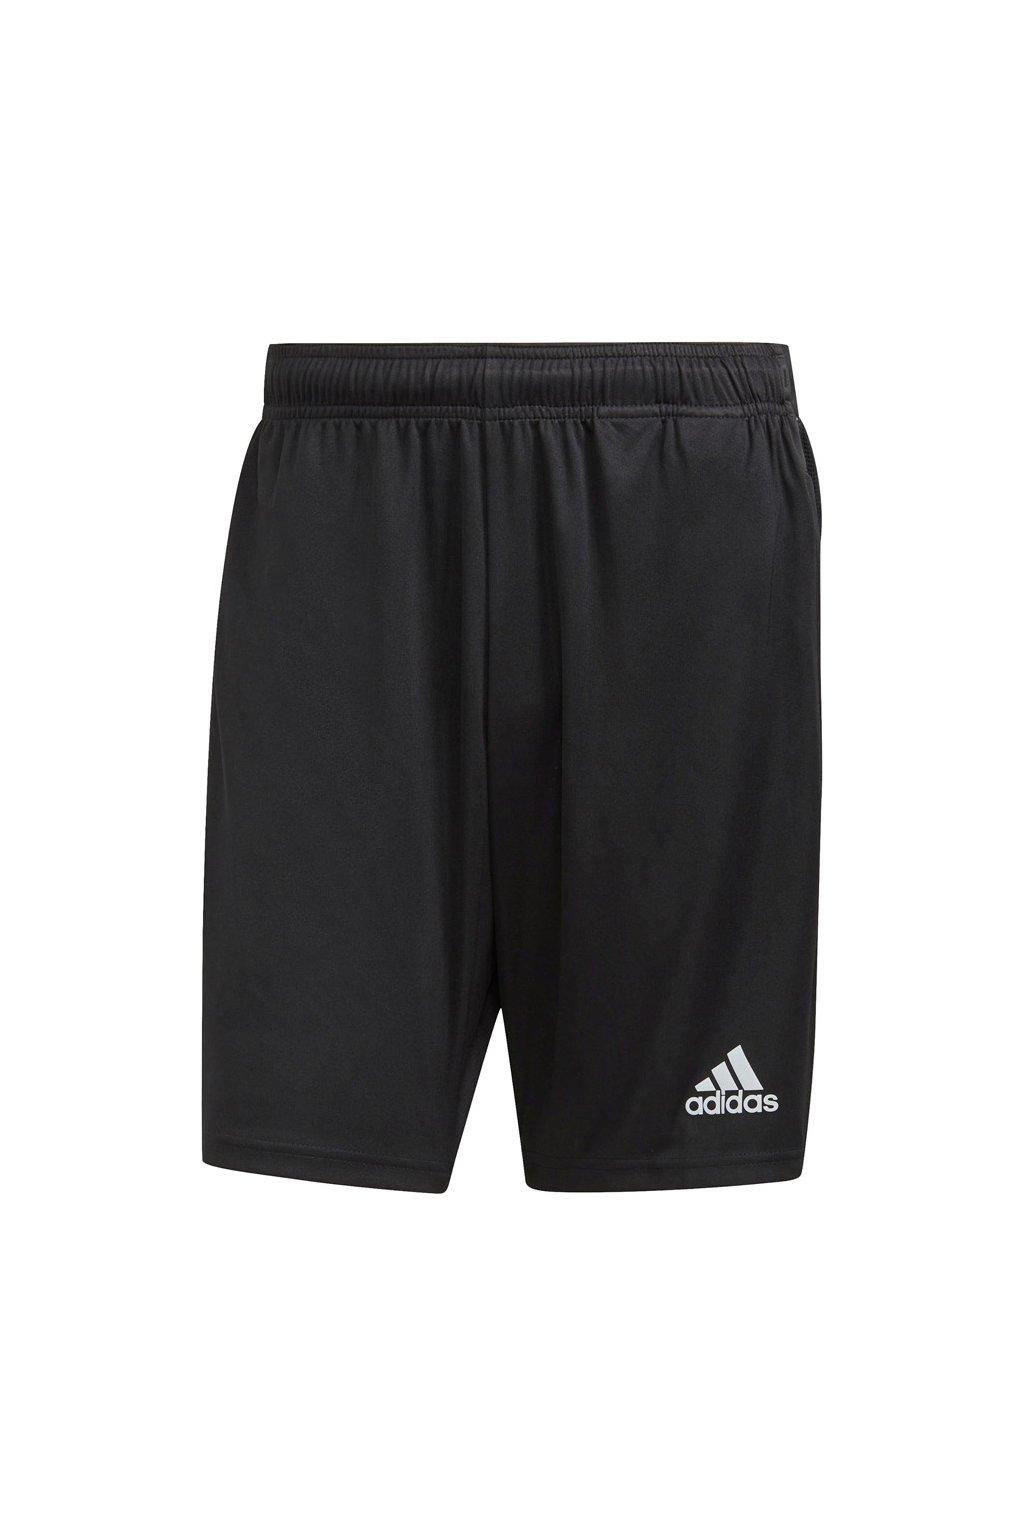 Pánske kraťasy Adidas Tiro Short Reflective Wording čierne GQ1038